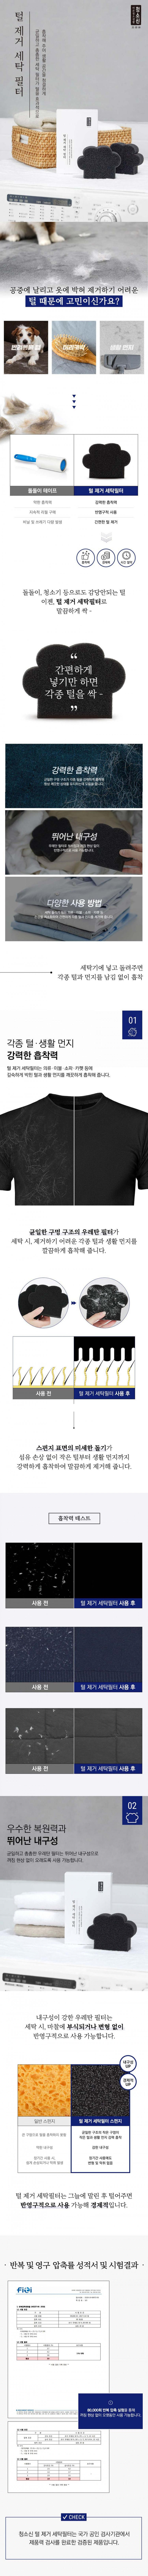 hair remover laundry filter_털제거 세탁필터